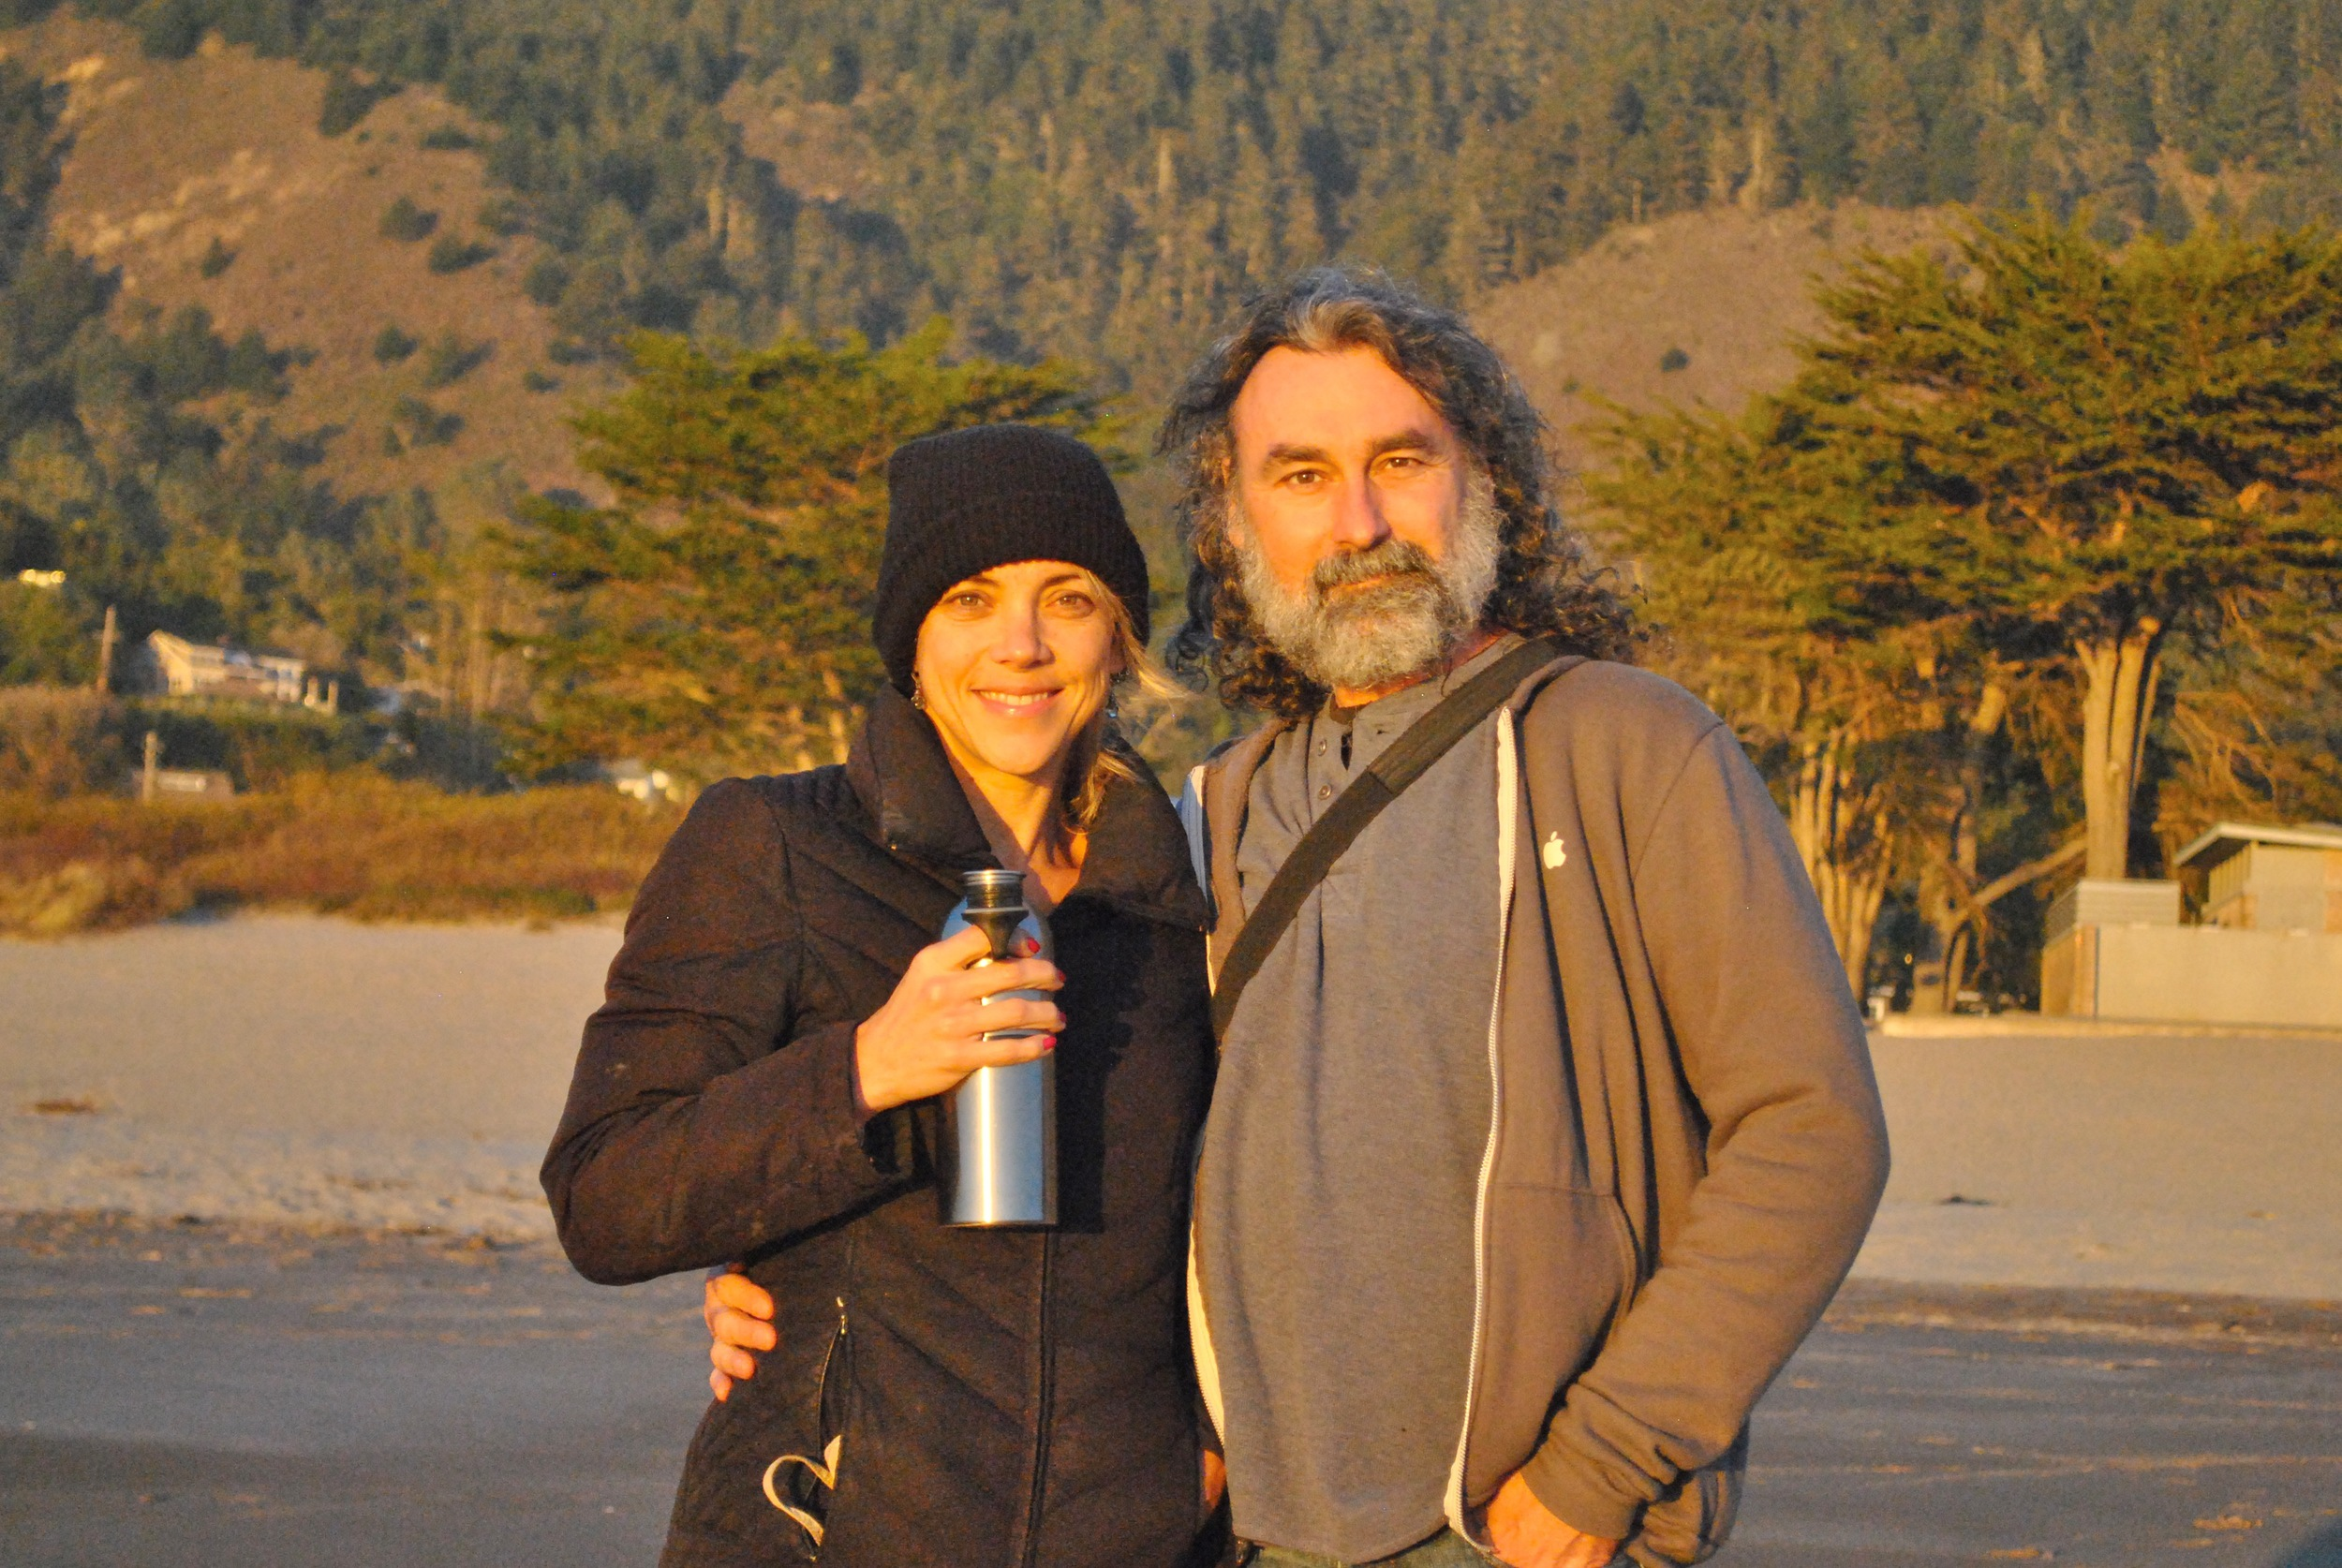 Shiloh and I at Stinson Beach, California,photo by Savannah.